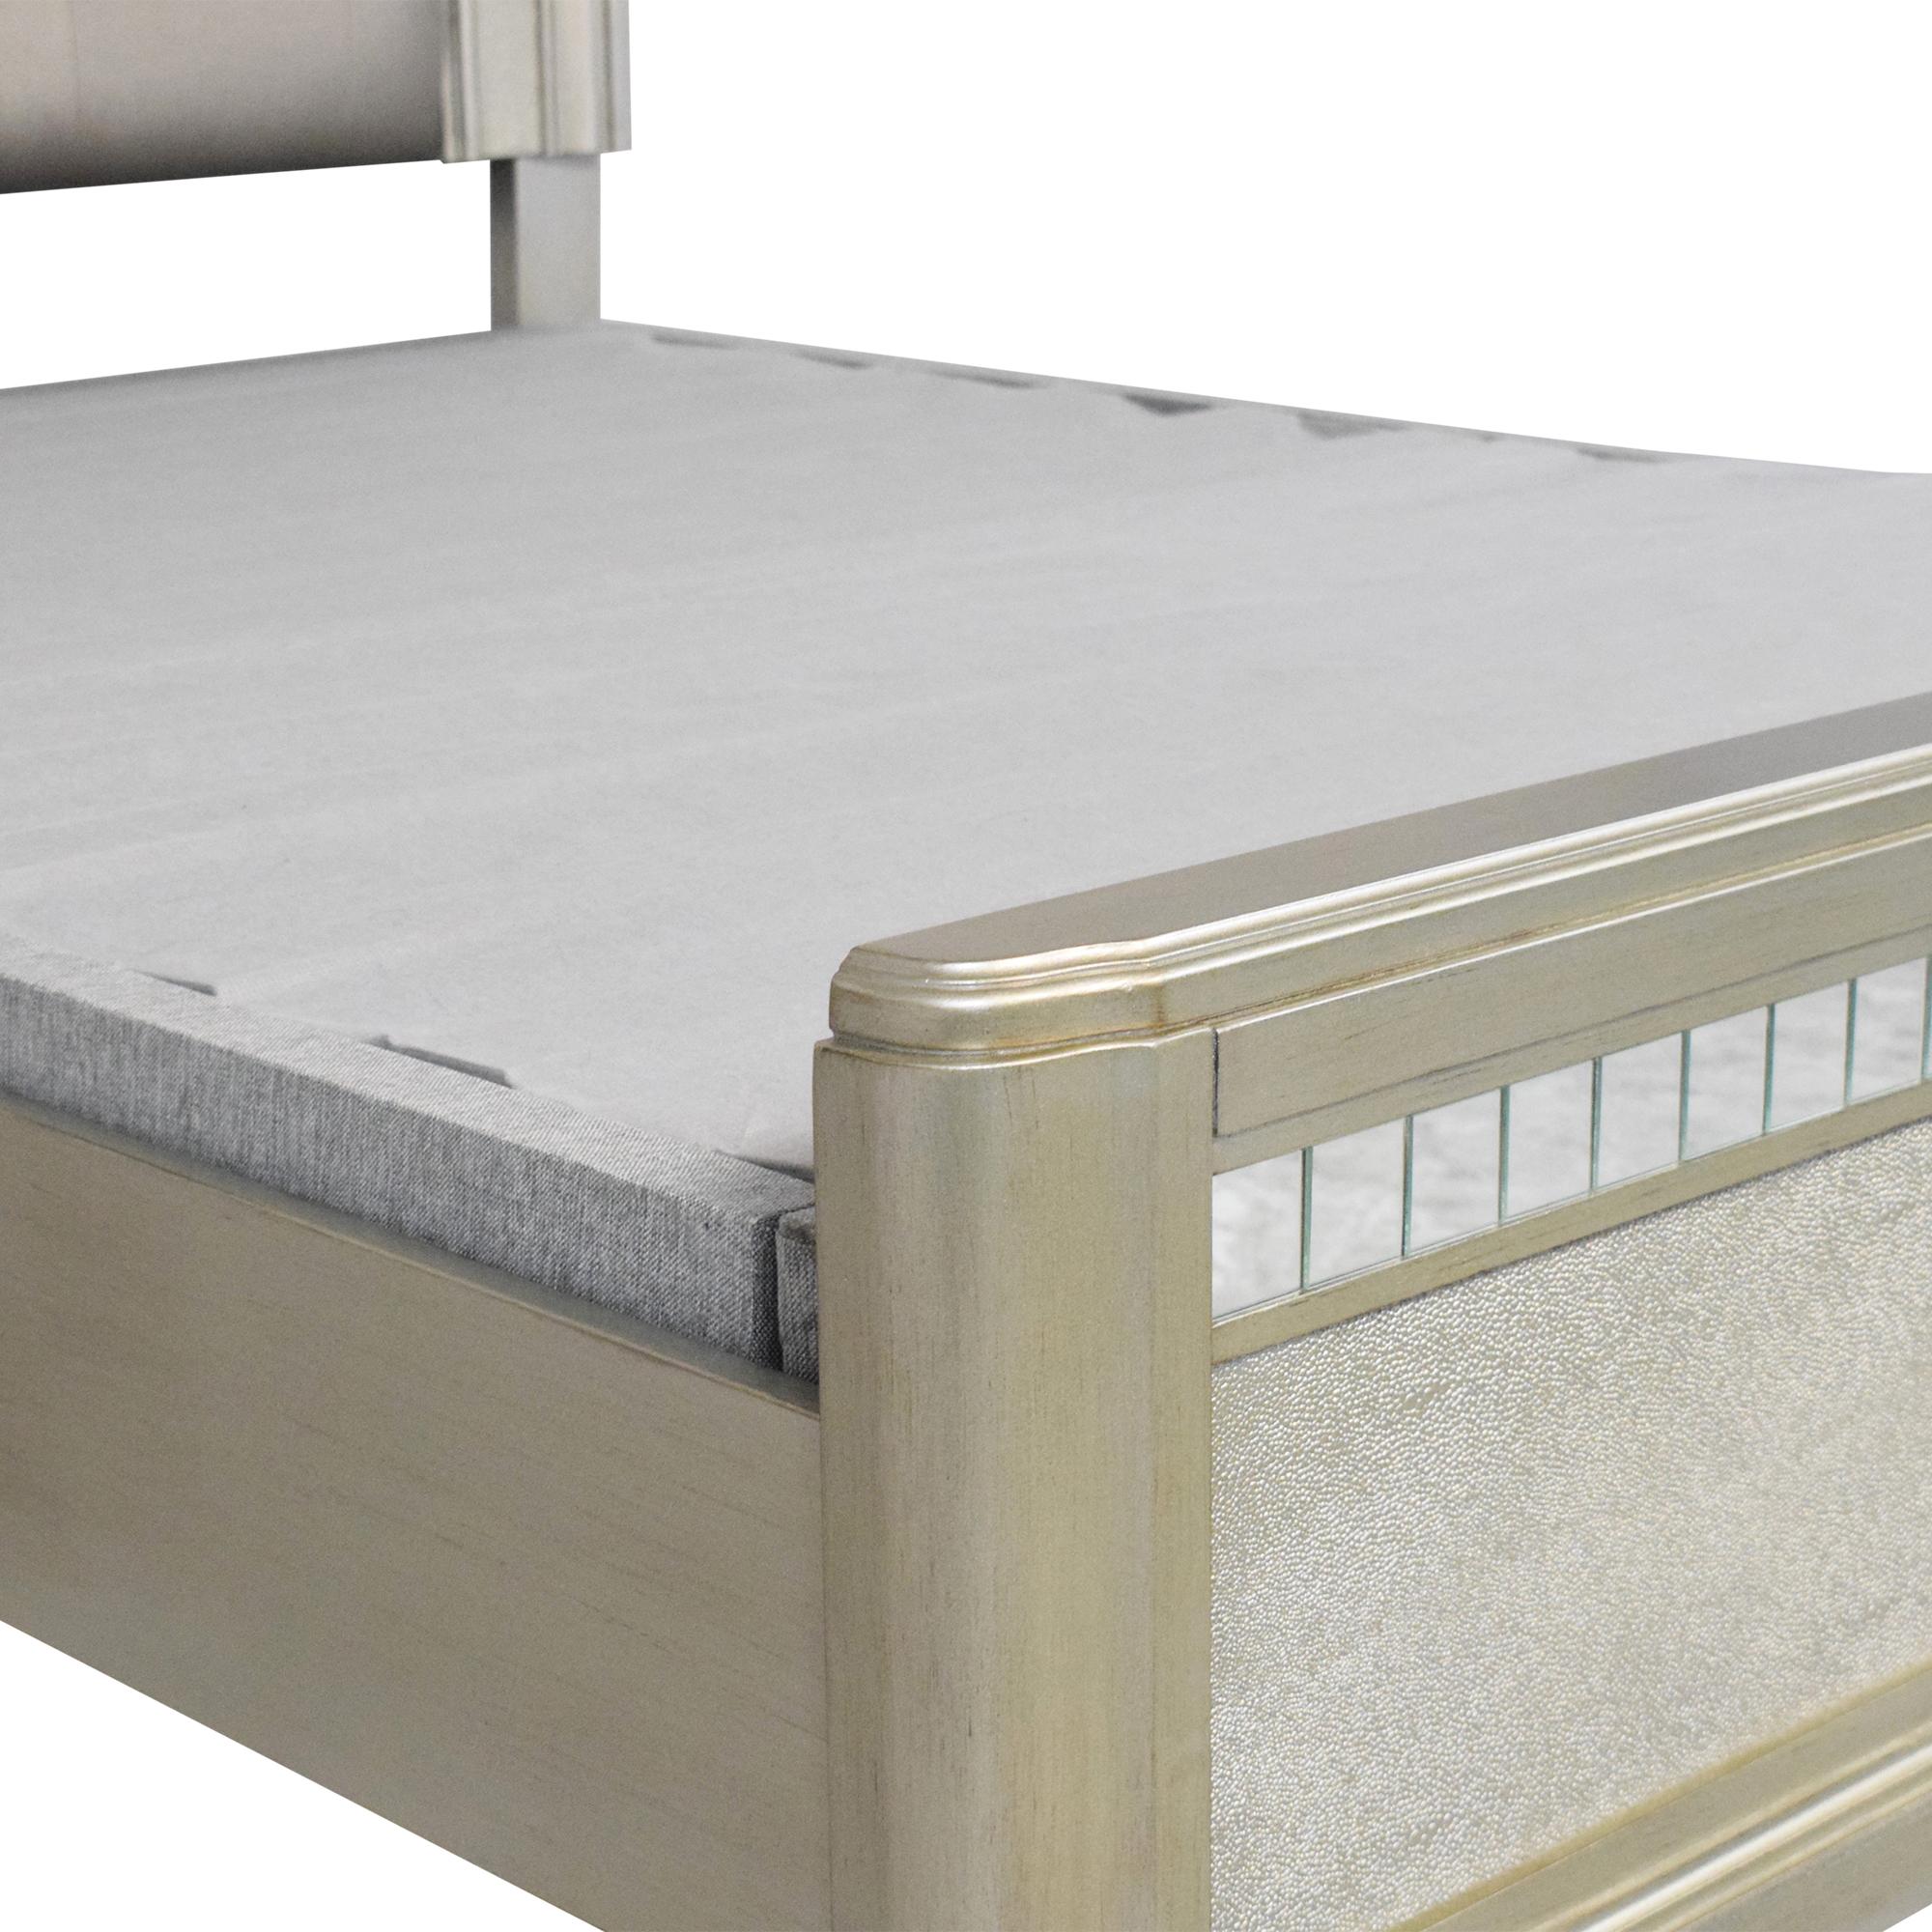 Wayfair Wayfair Annunziata Upholstered Standard Queen Bed used